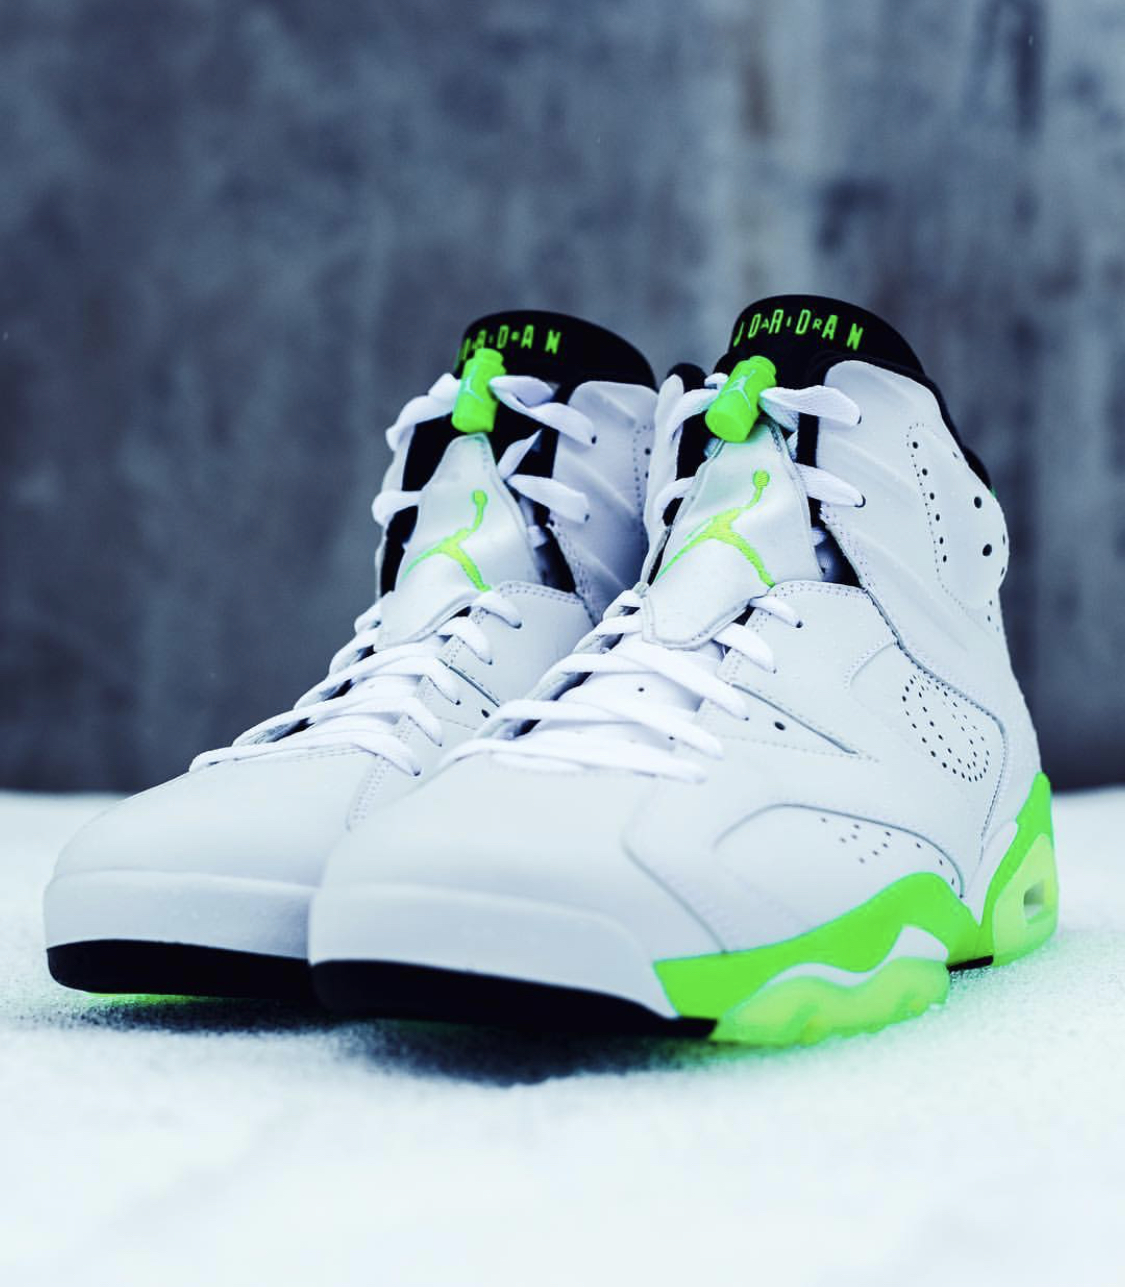 de55a1b104d3c2 Oregon Women s Basketball Custom Jordan 6s — UNISWAG